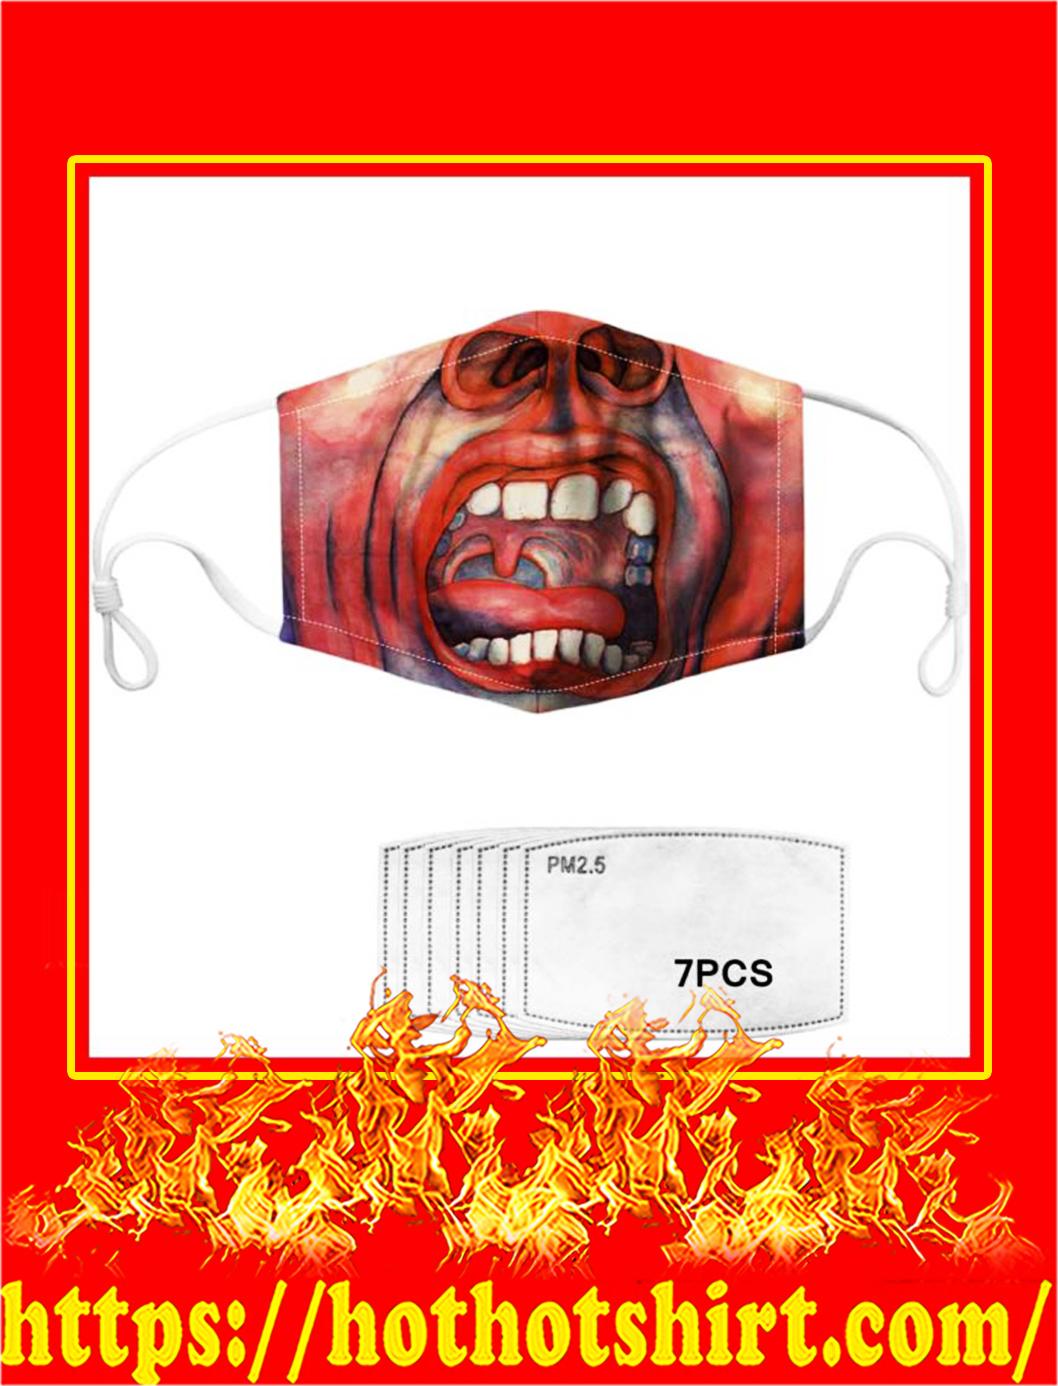 King crimson face mask- pic 1